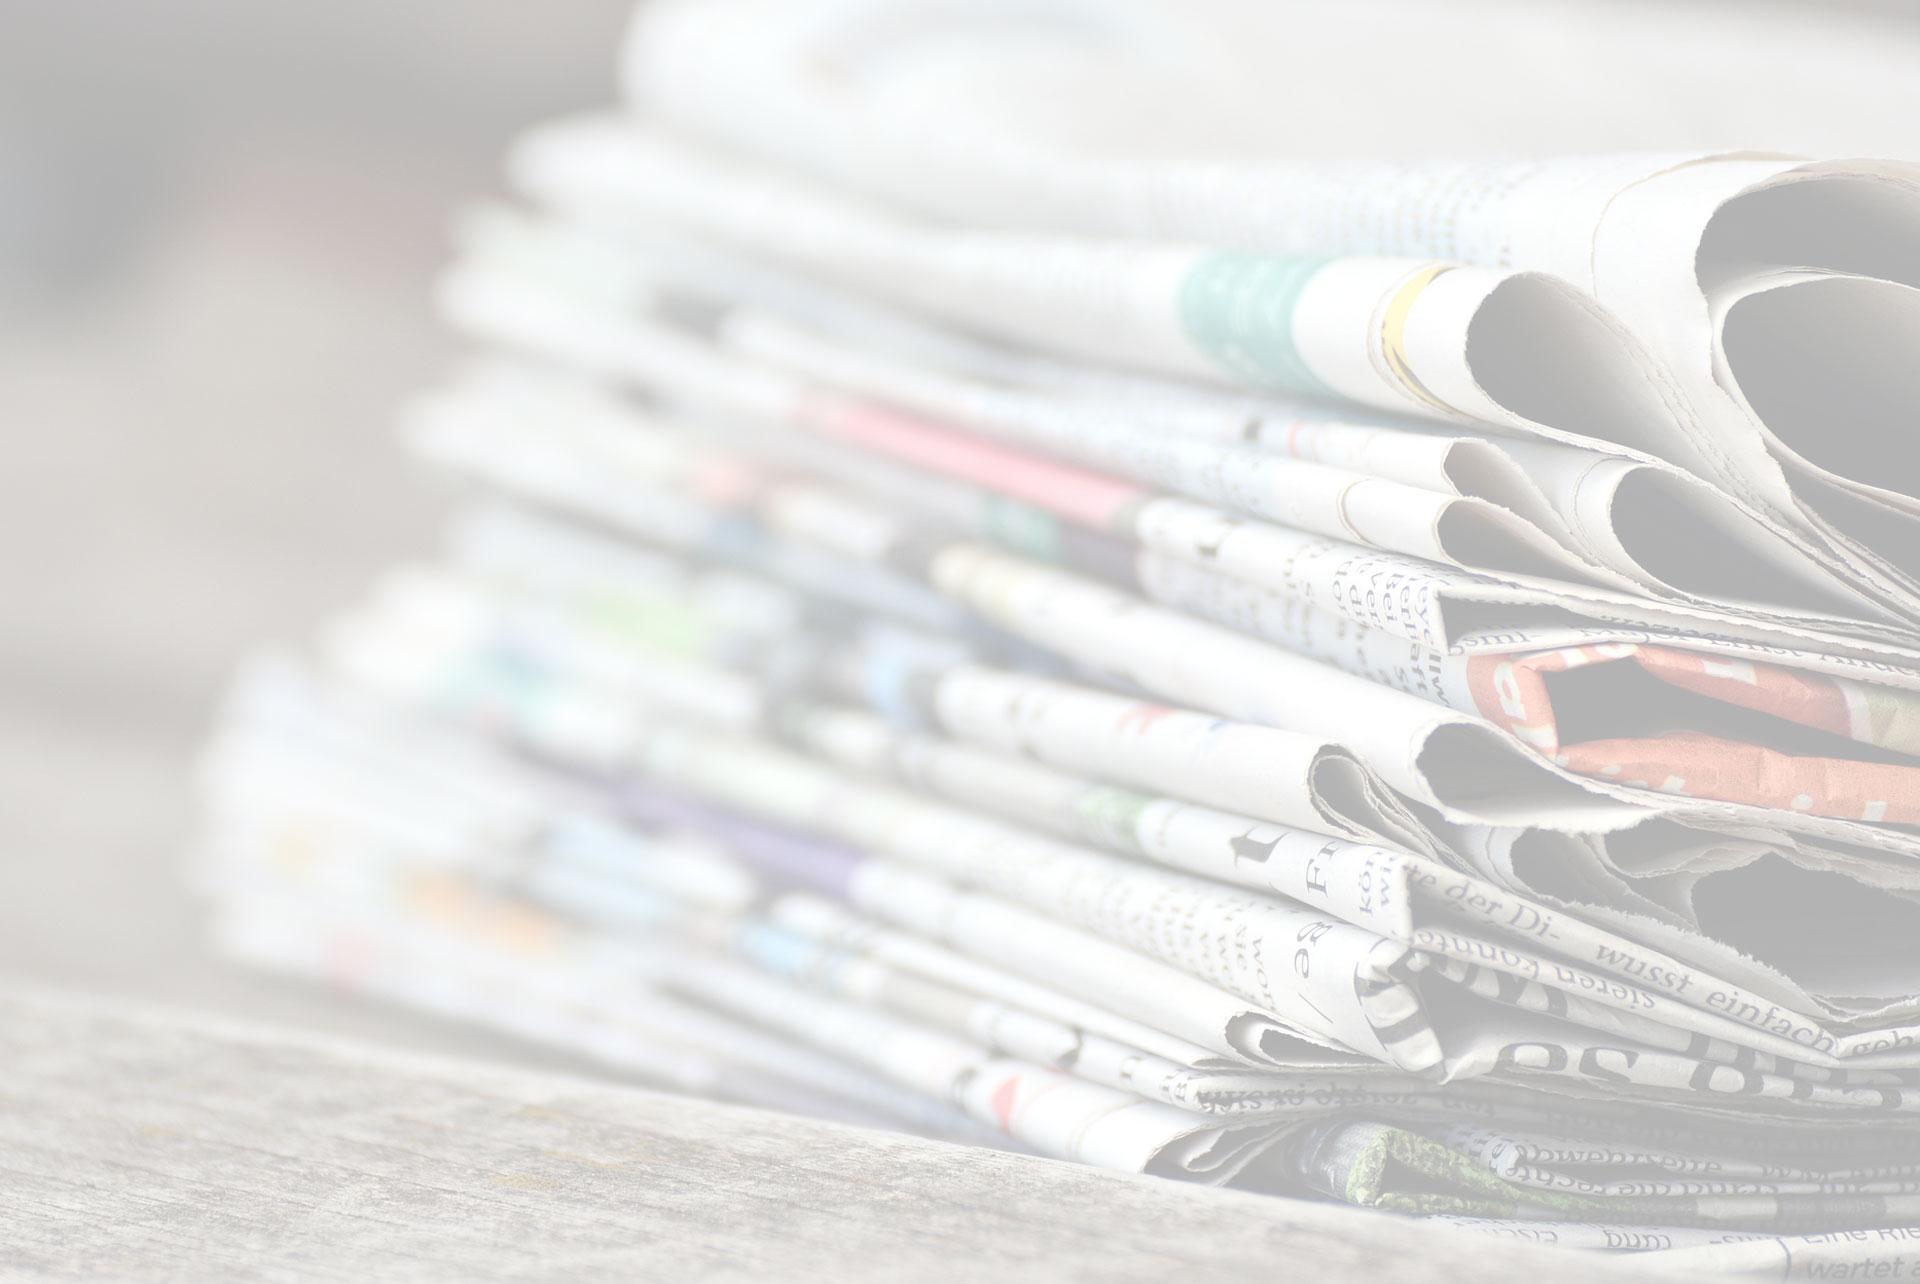 BMW X5 vs Range Rover Sport